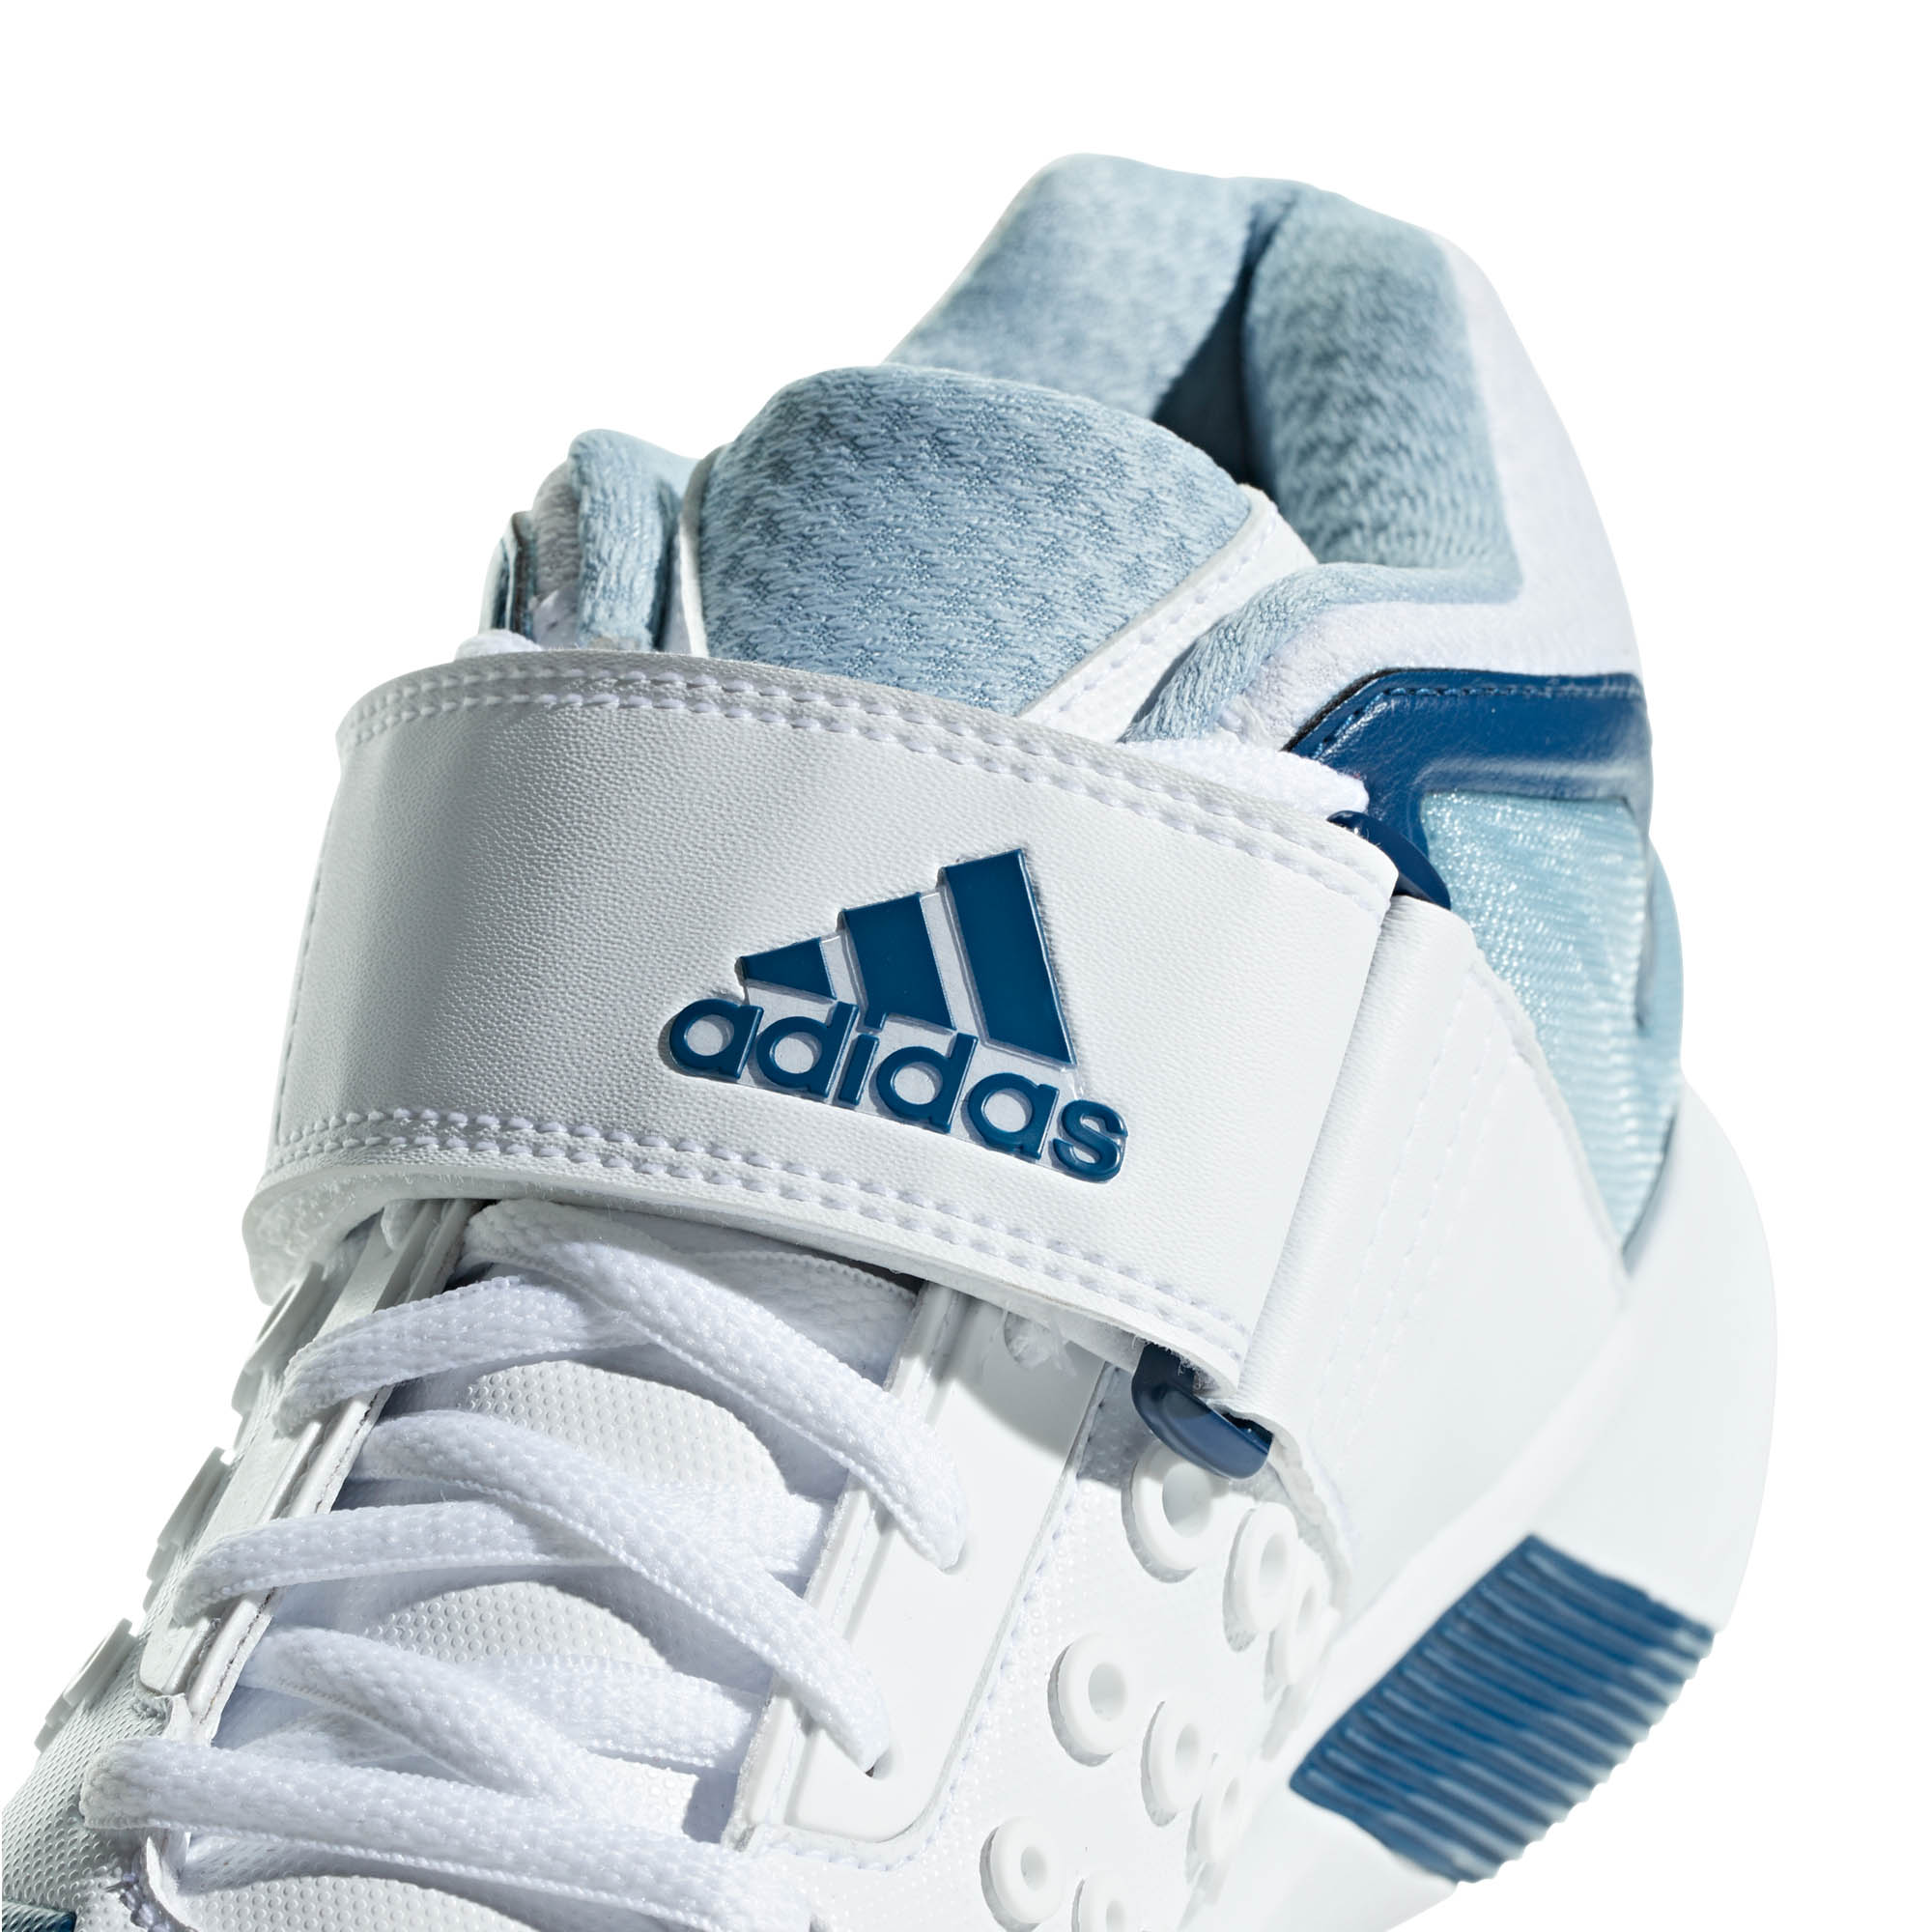 ADIDAS ADIDAS ADIDAS adiPower Vector MID da uomo adulto Cricket Trainer Spike Scarpa Bianco Blu f83d55